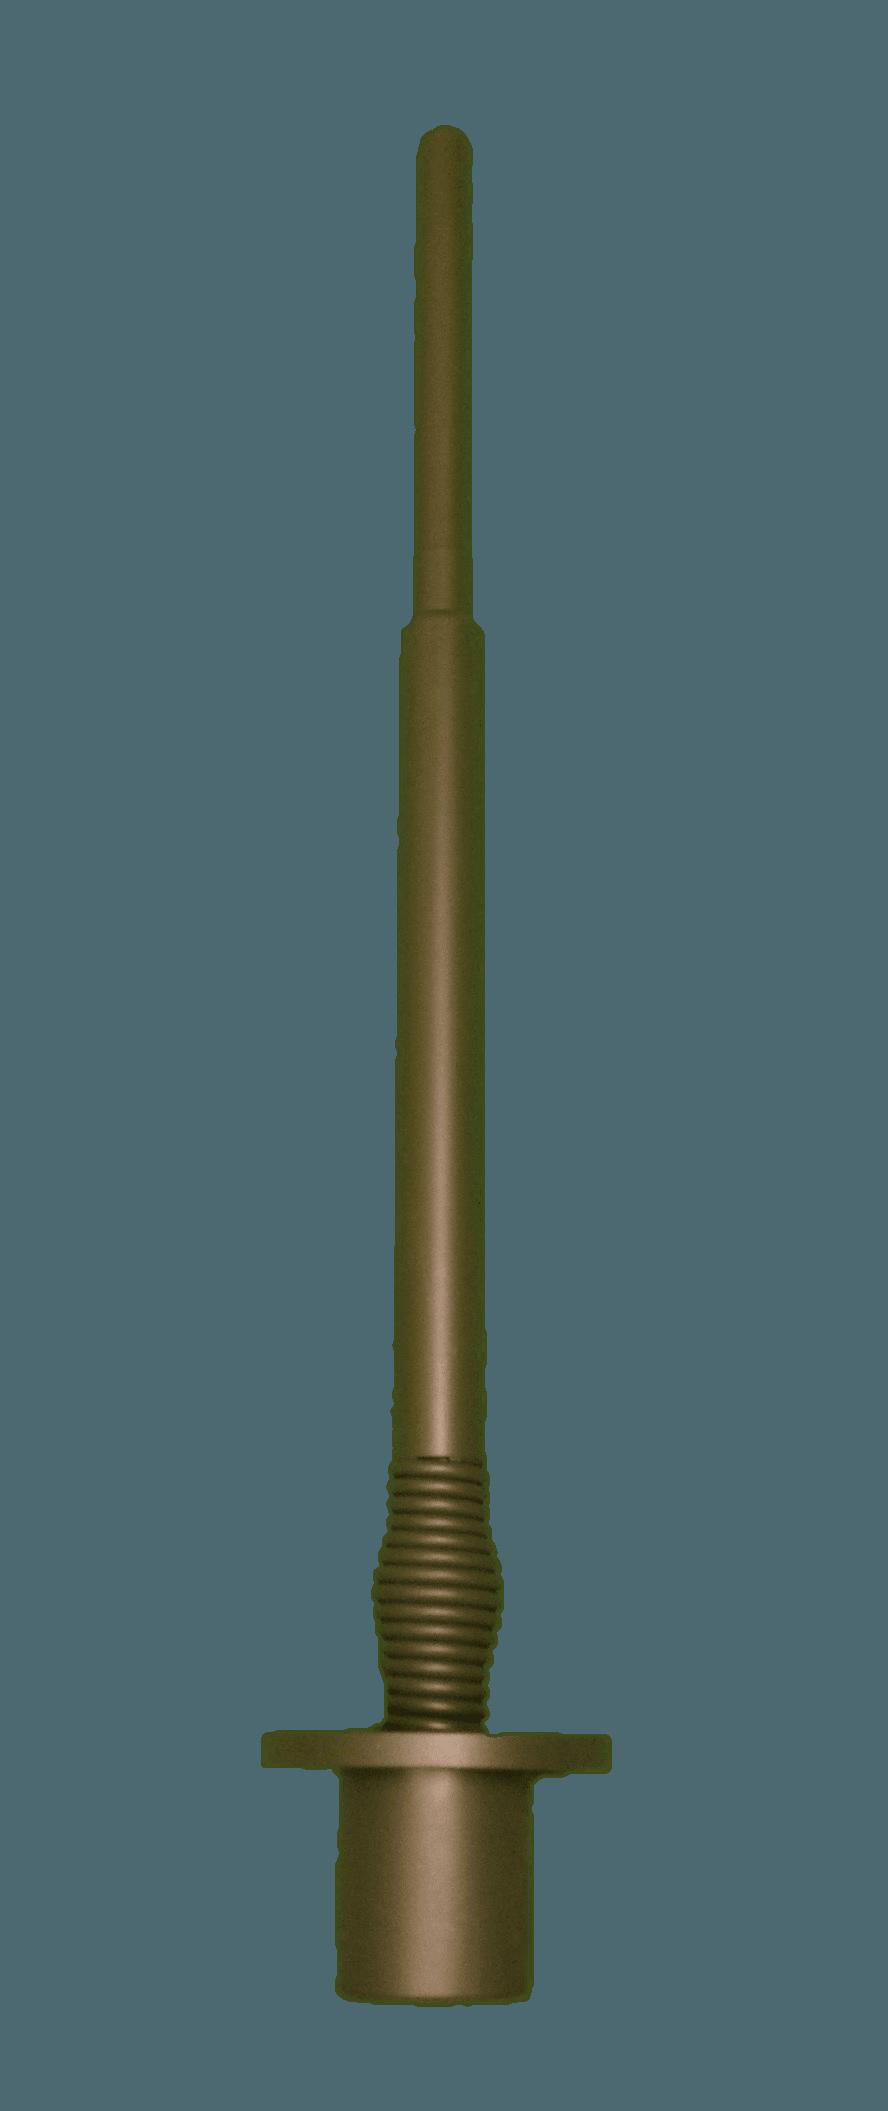 4400-5000 MHz – MVDP4.4-5.0-7-D